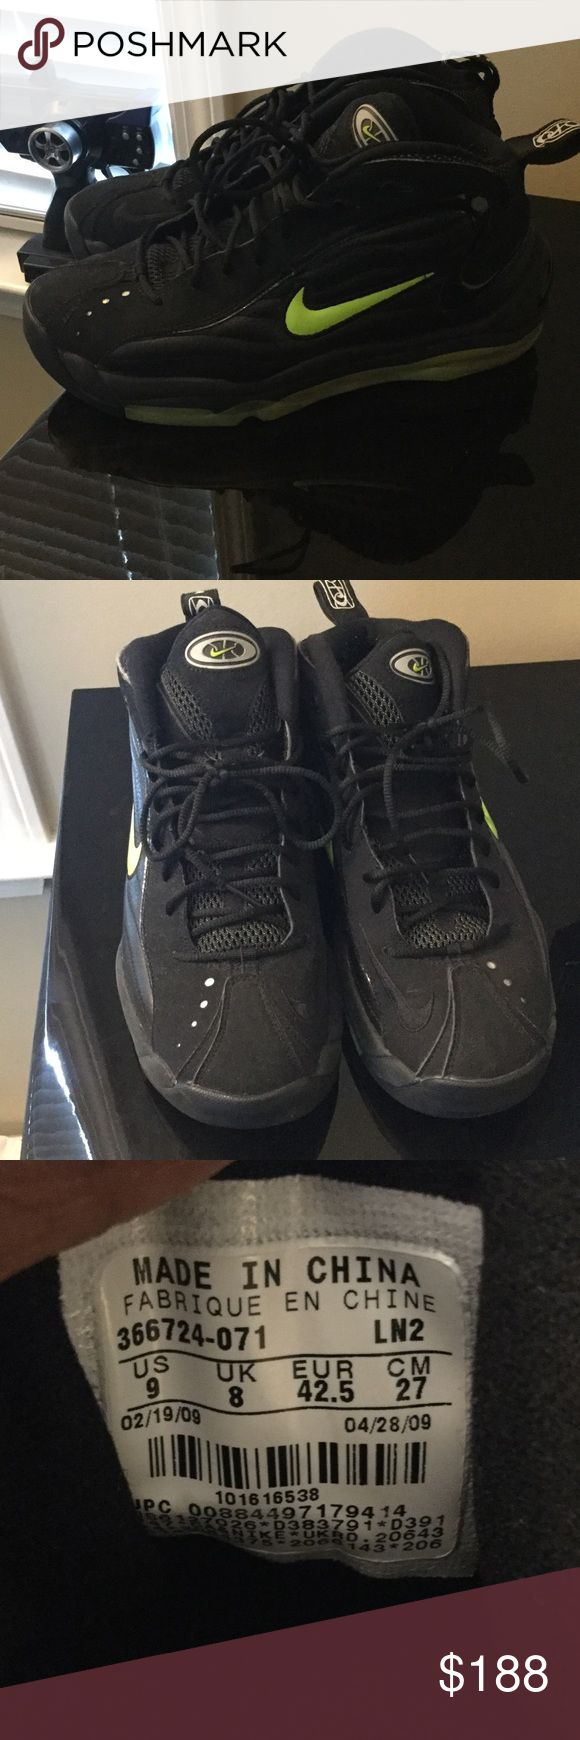 girls jordan shoes size 9-5 mac rumors imac 825070